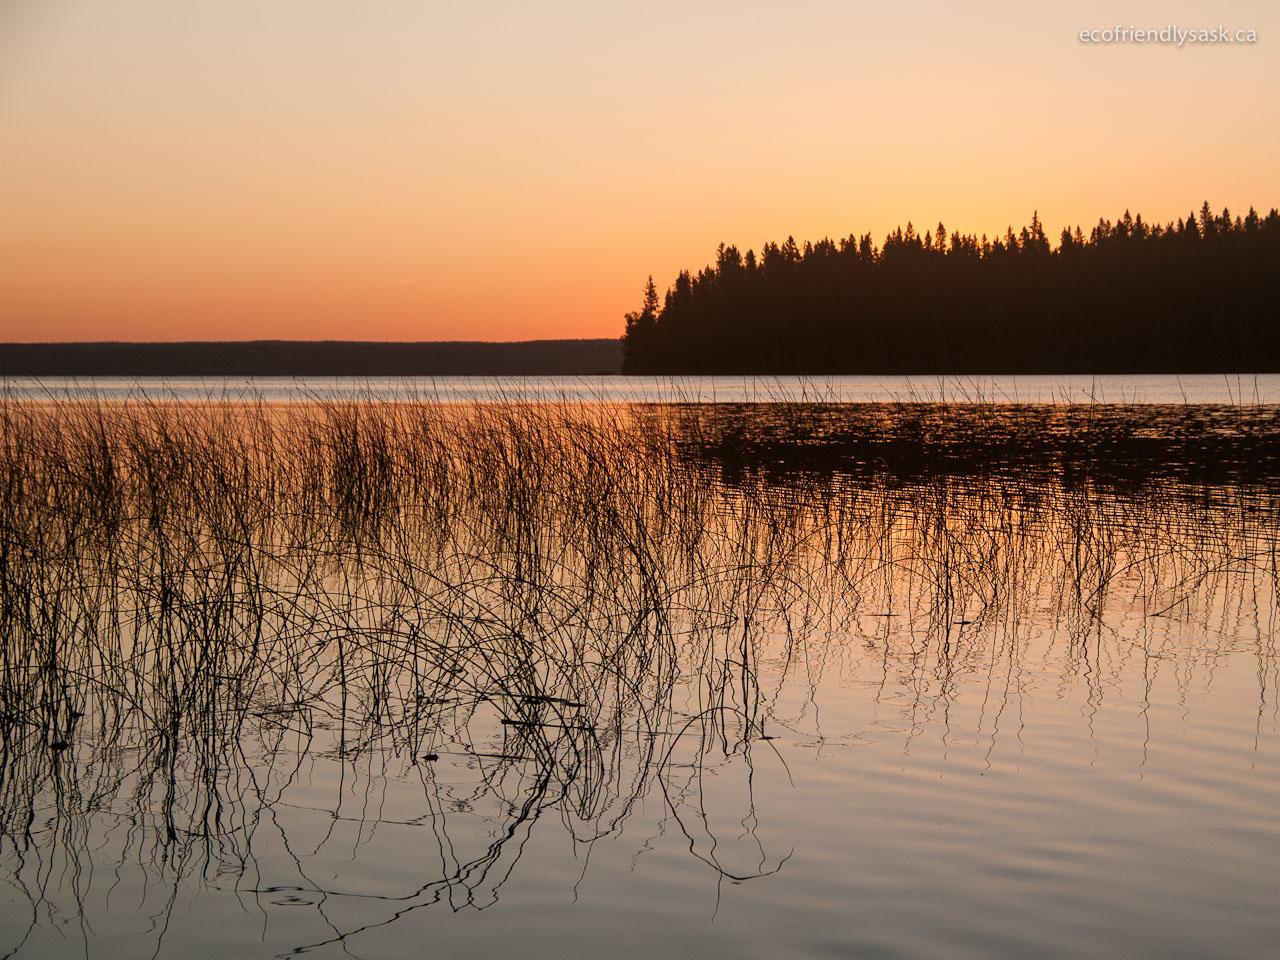 EcoFriendly Sask: A Change of Scene